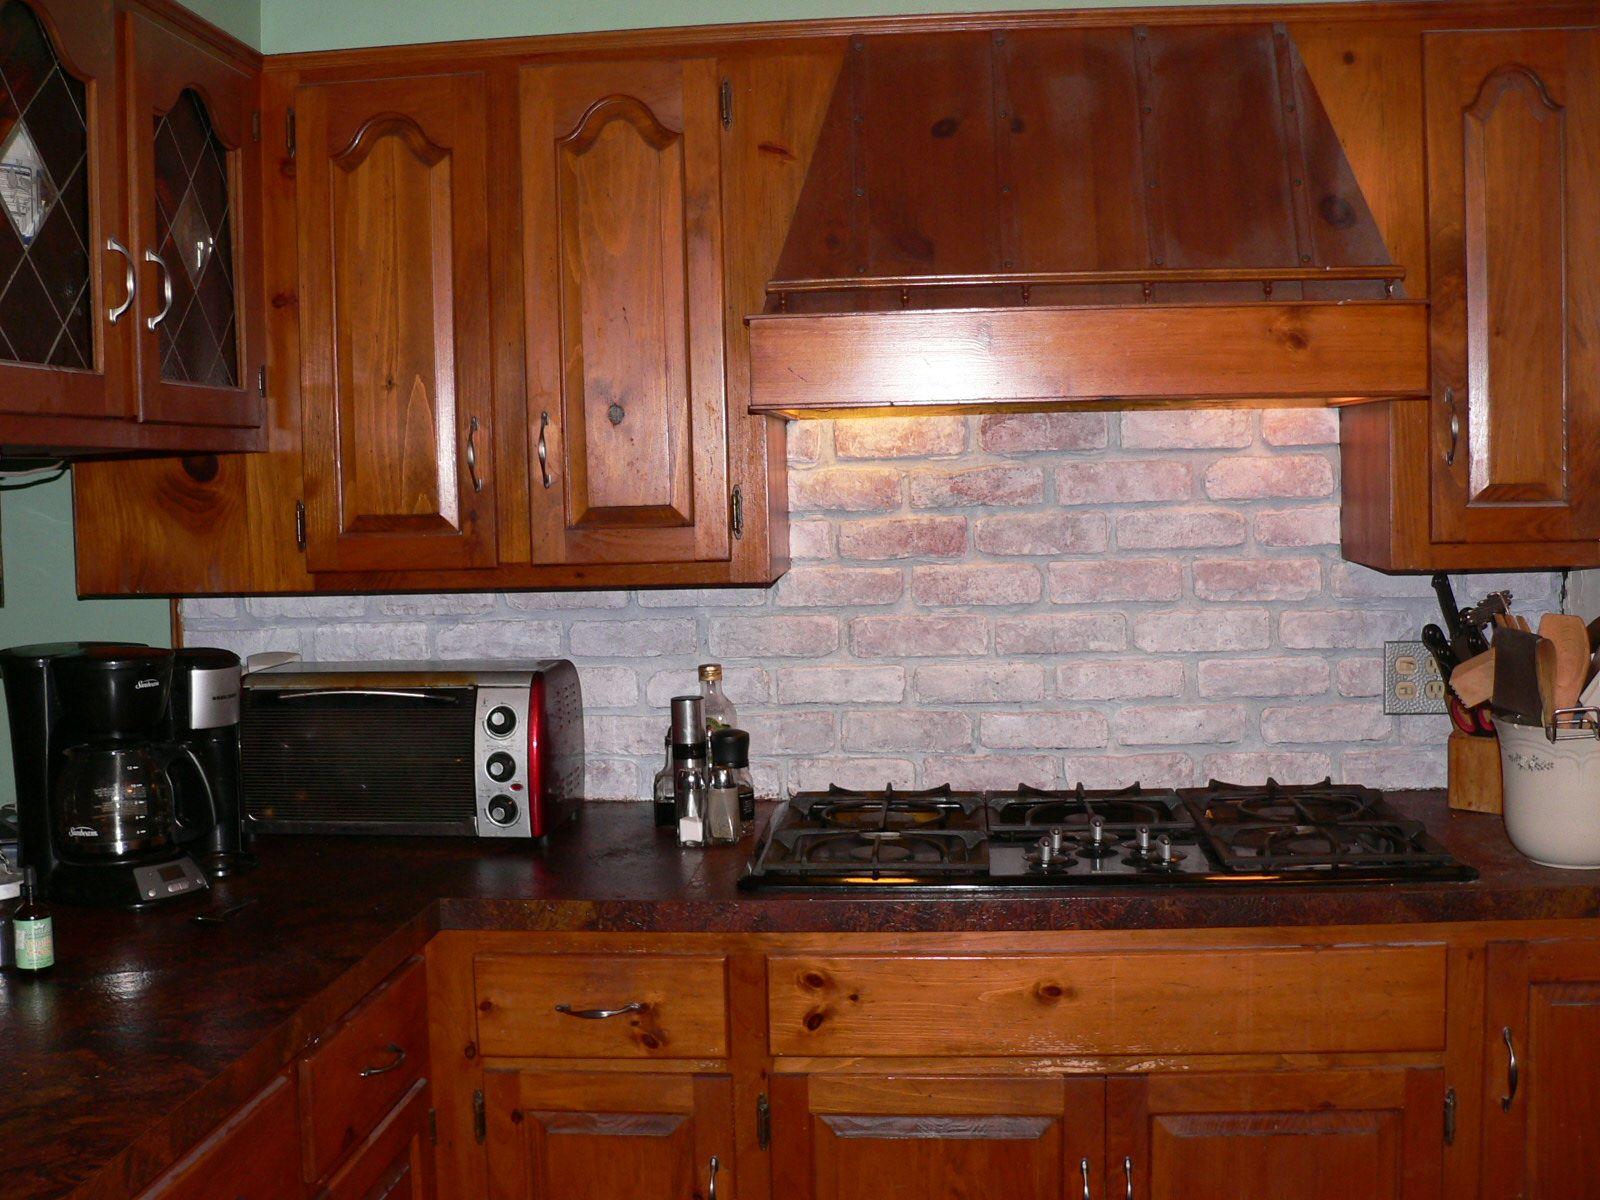 brick backsplash ideas. Brick Backsplash For kitchens | Whitewashing My Faux Backsplash Ideas